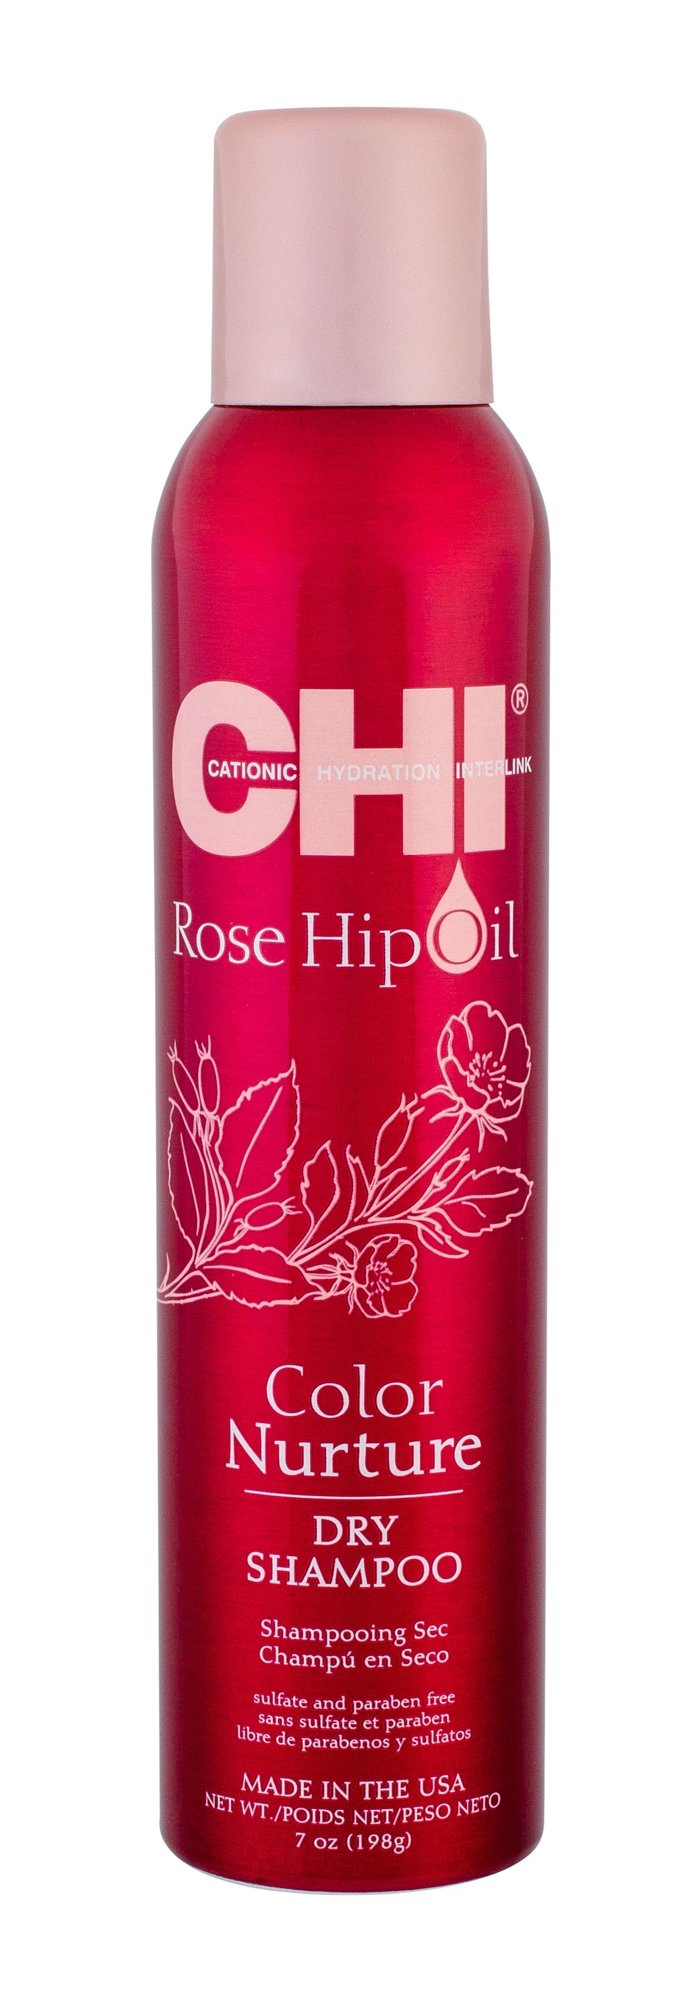 Farouk Systems CHI Rose Hip Oil Dry Shampoo 198ml